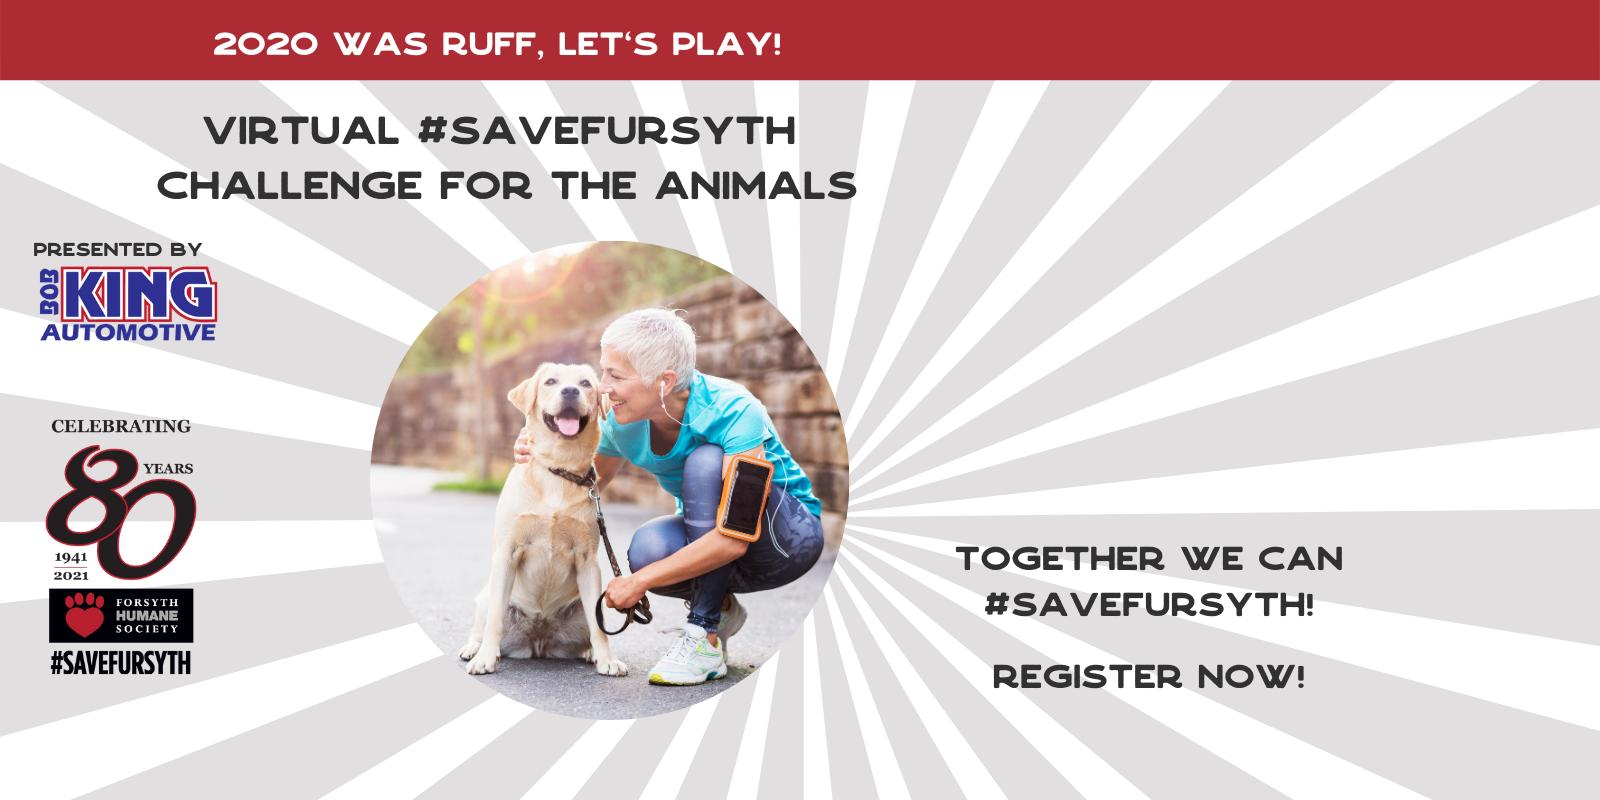 Virtual #SAVEFURSYTH Challenge for the Animals